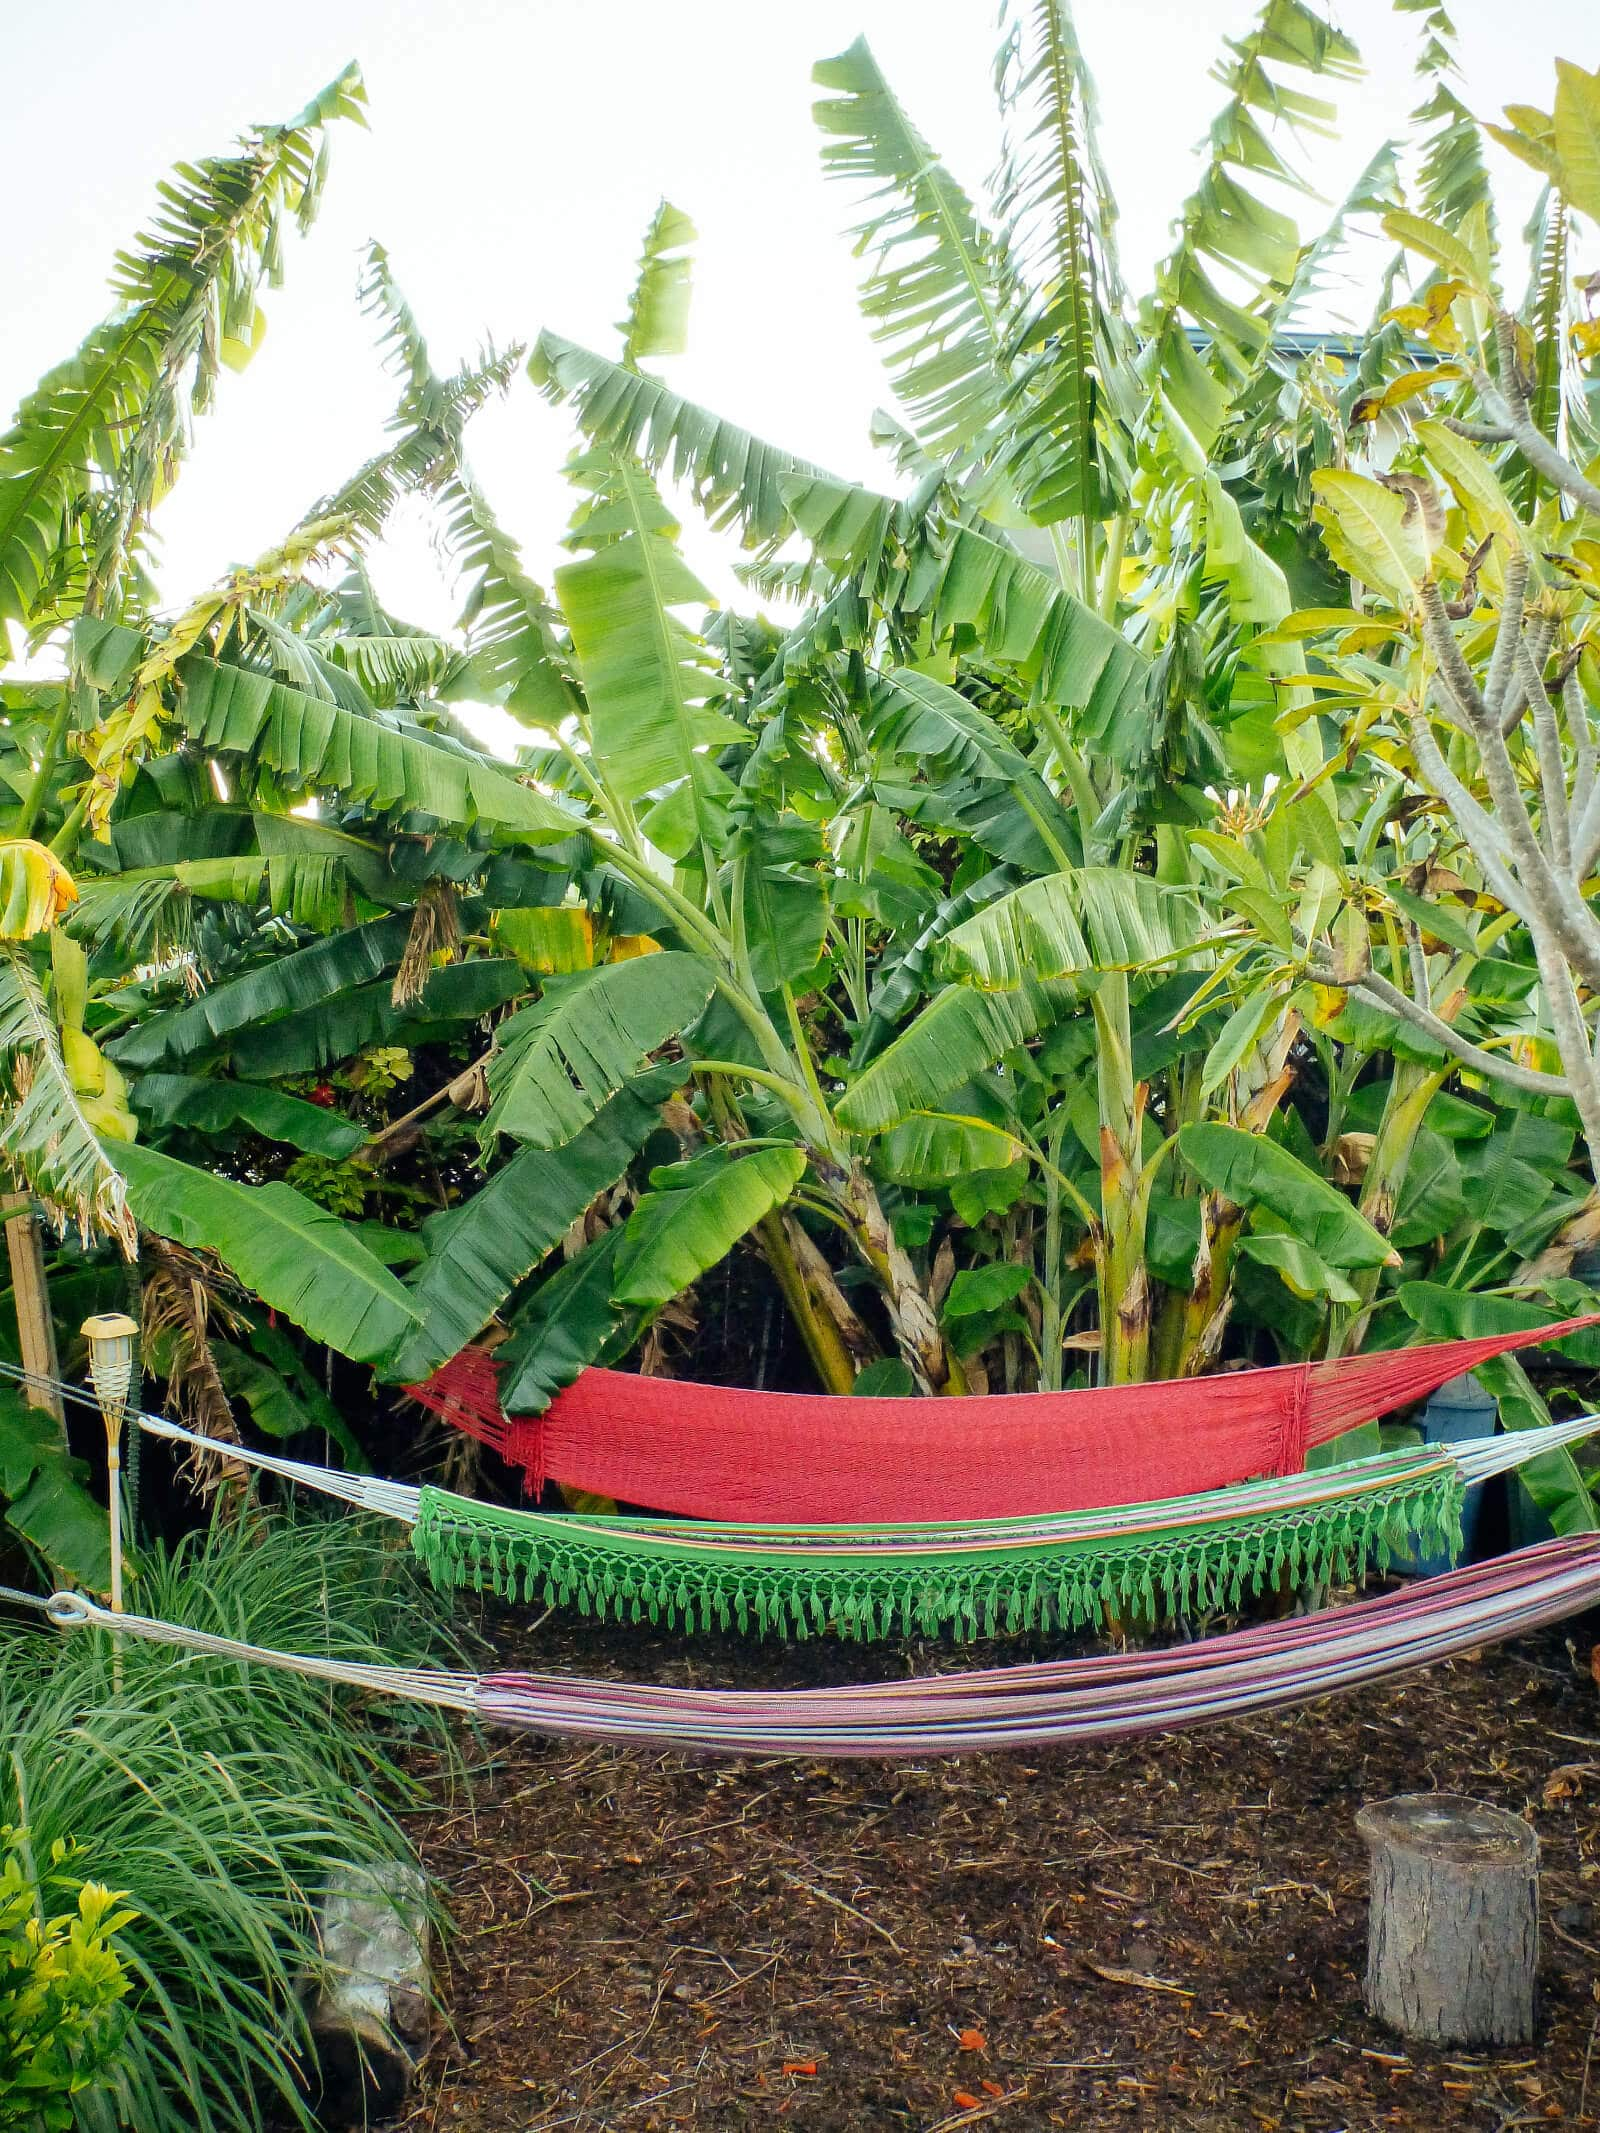 Banana plants growing in a Southern California backyard